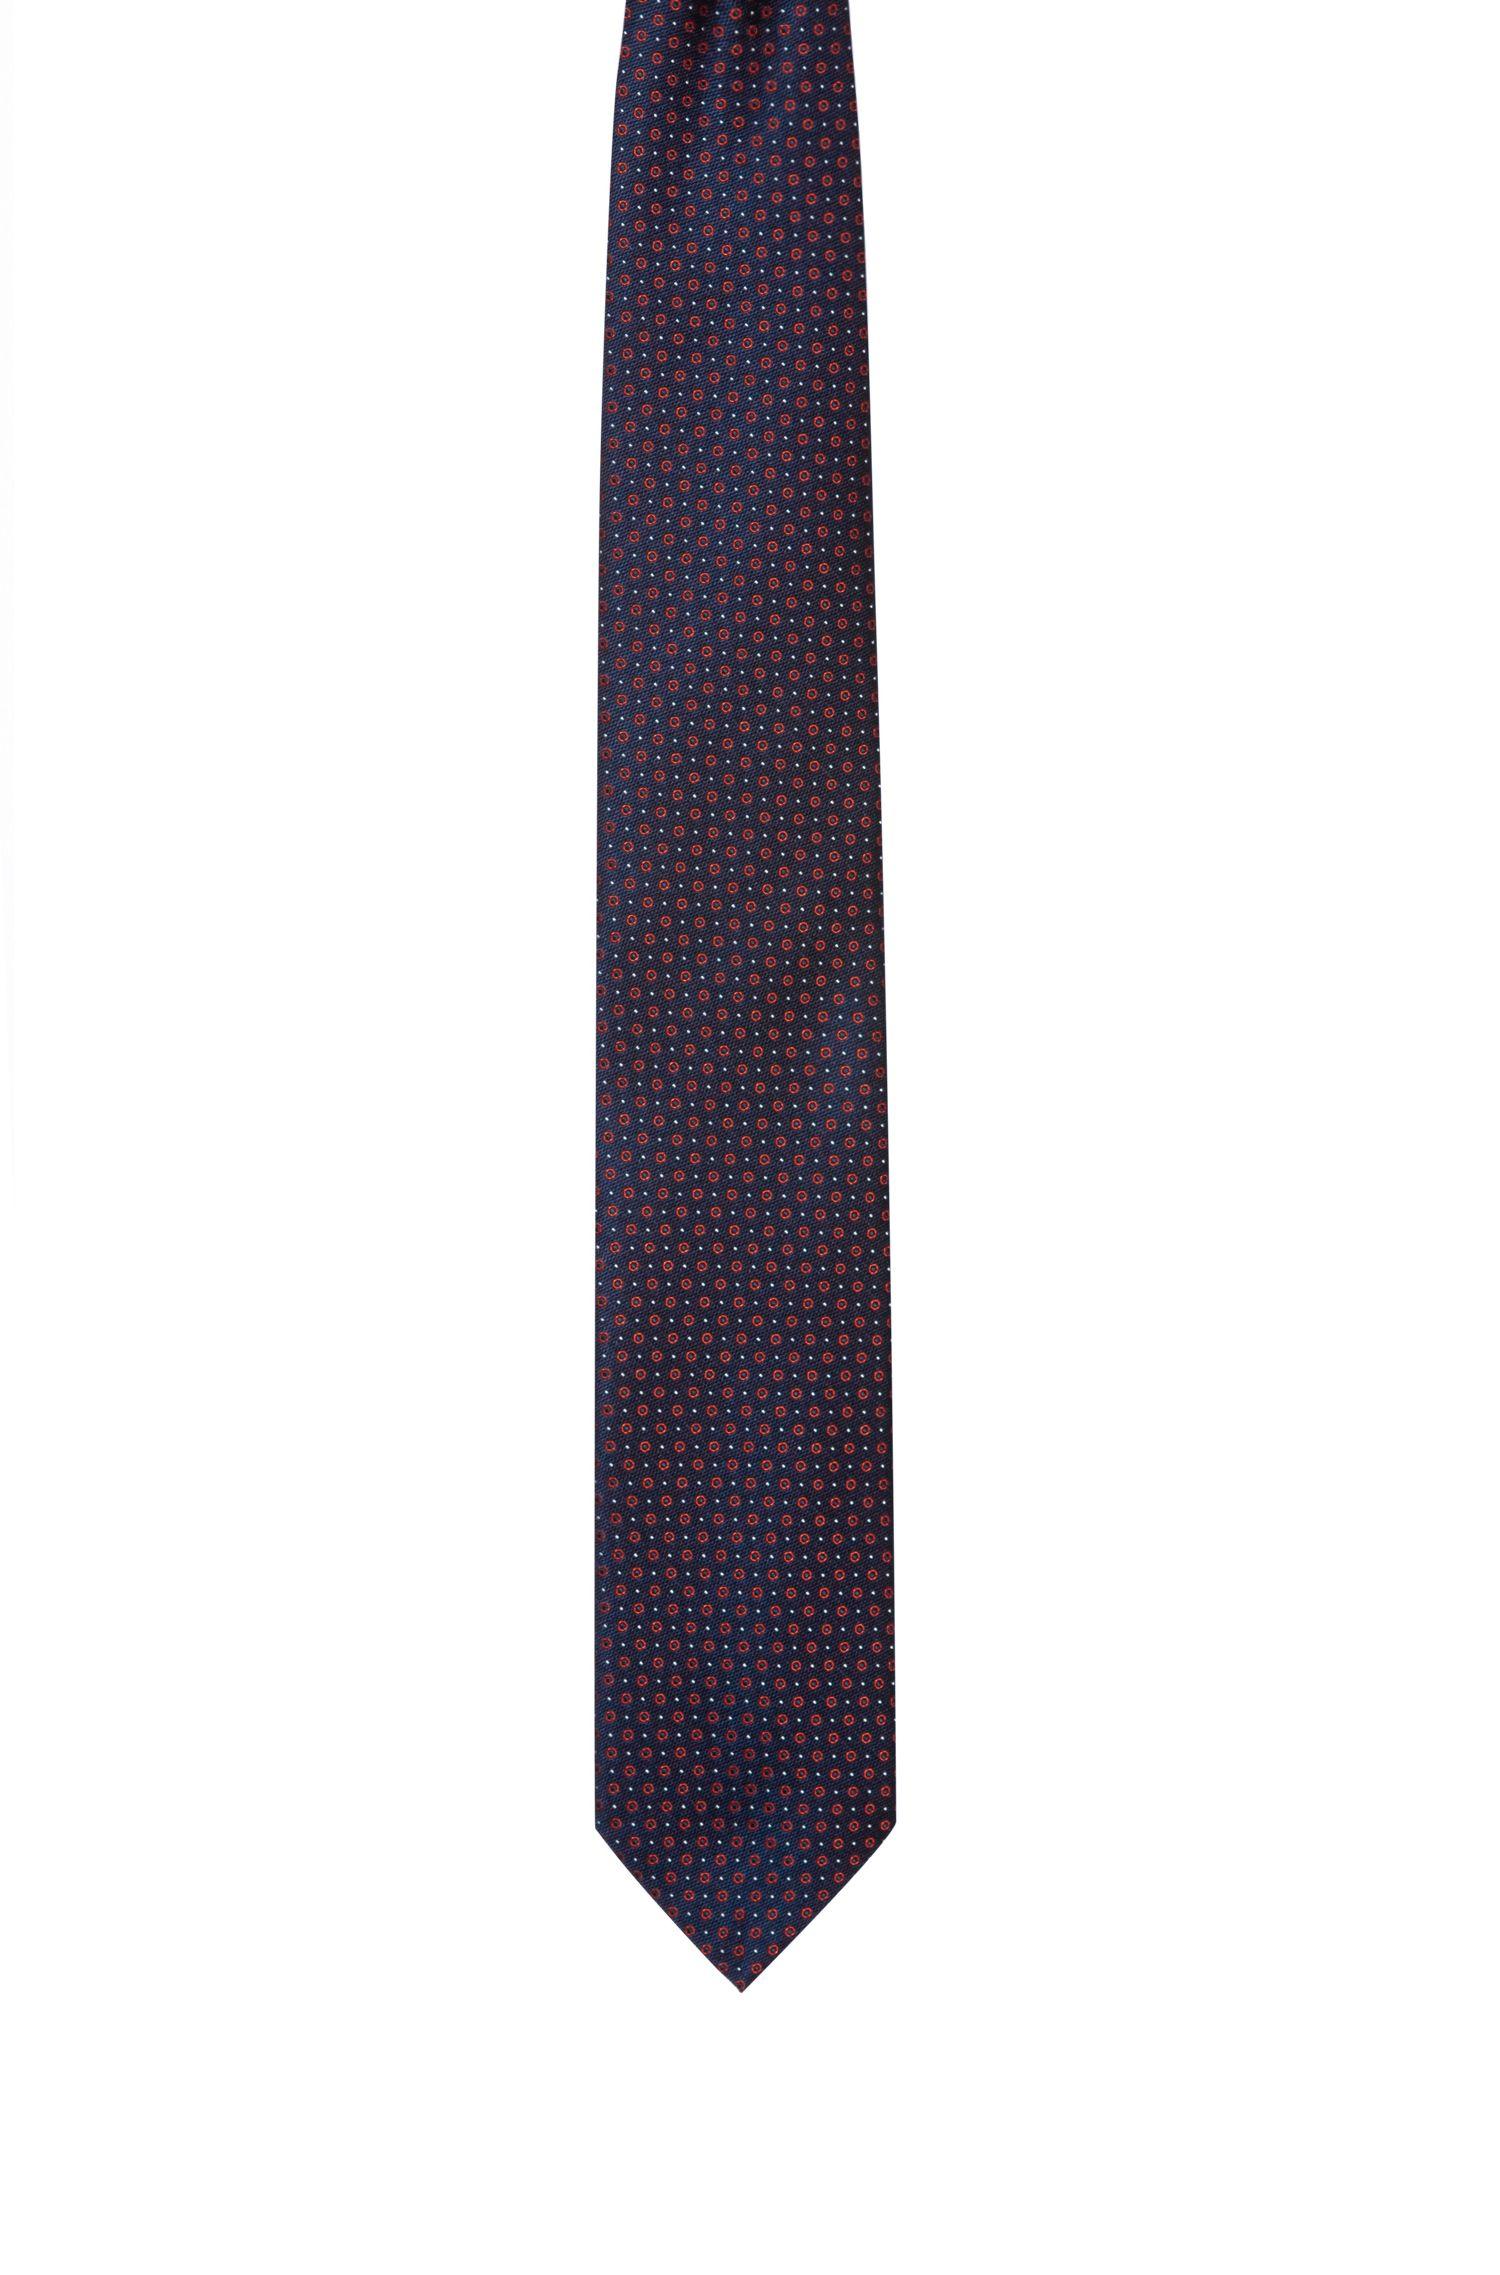 Krawatte aus Seiden-Jacquard mit filigranem Muster, Gemustert